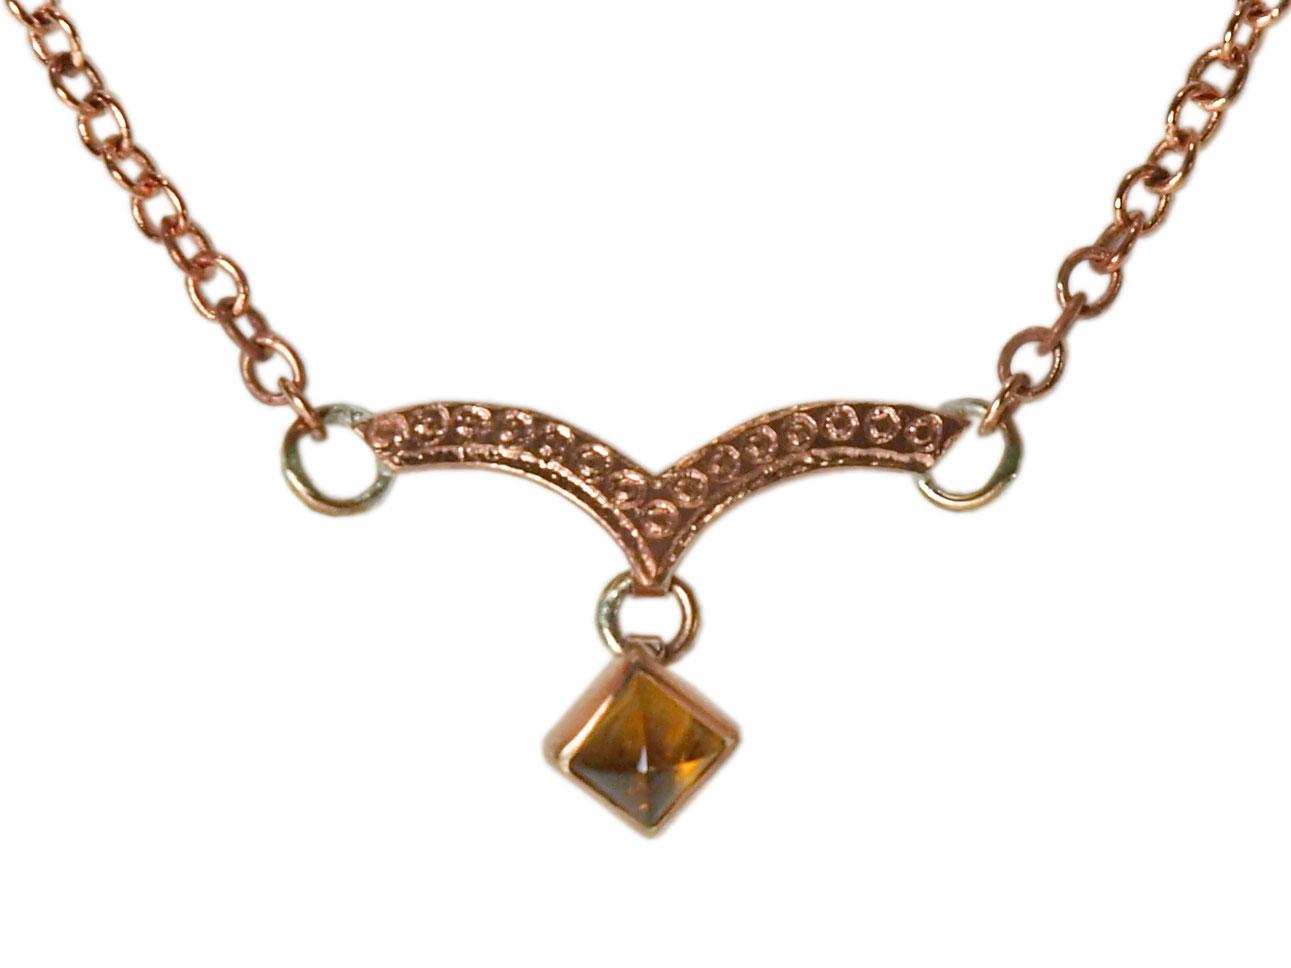 Dew Drop Necklace with Citrine